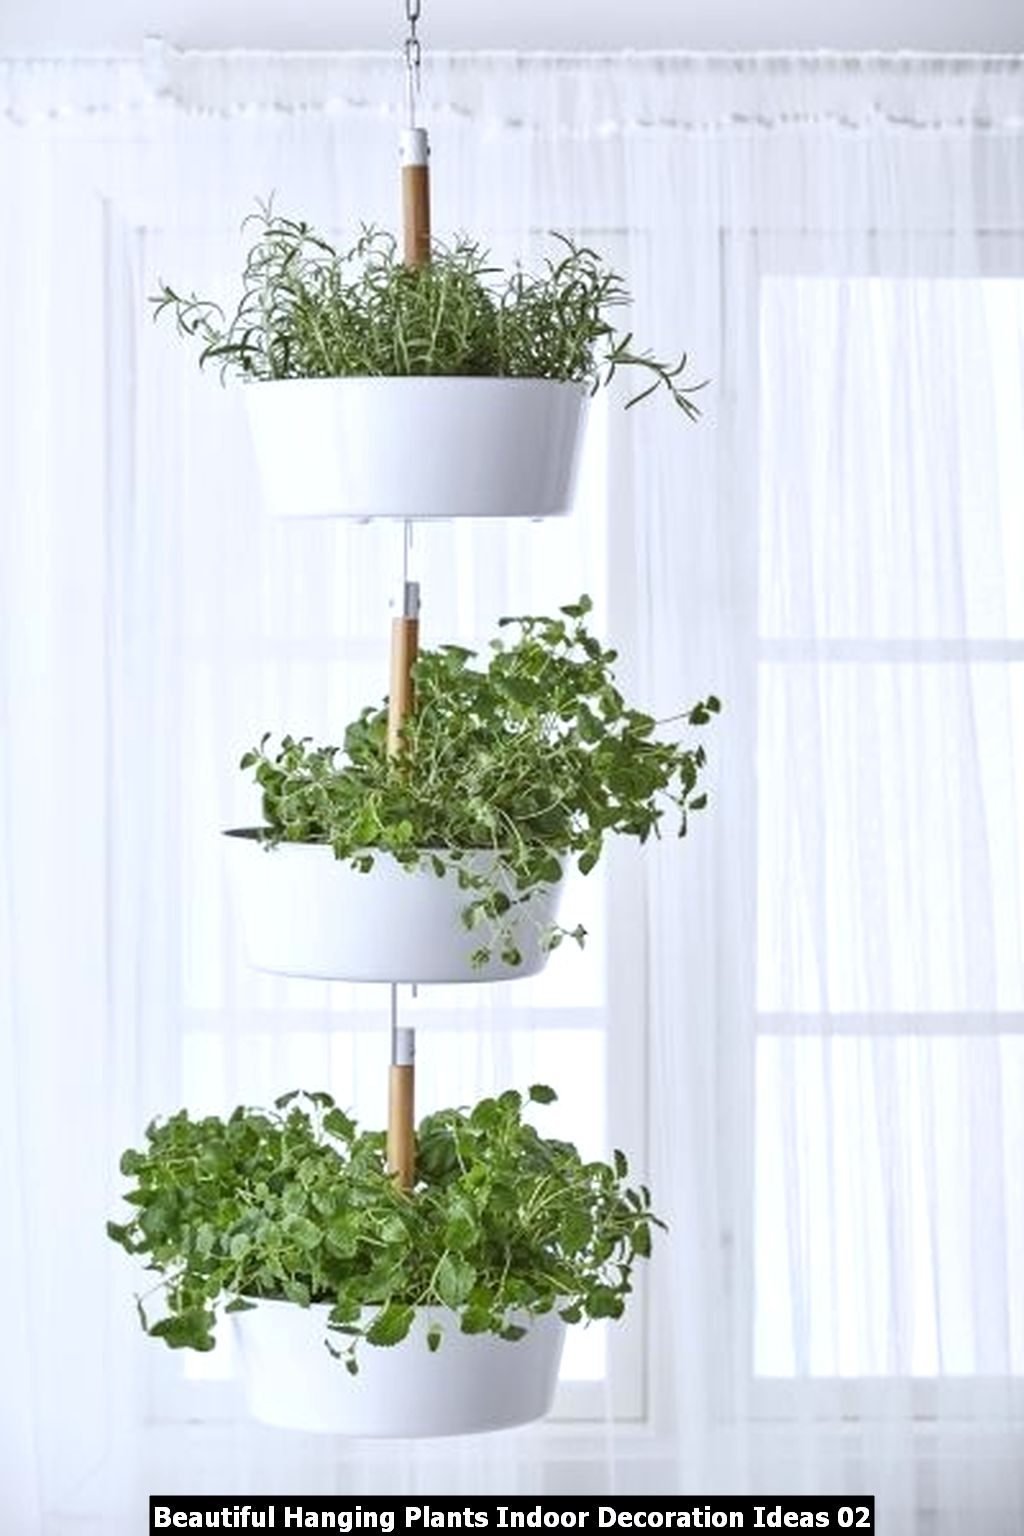 Beautiful Hanging Plants Indoor Decoration Ideas 02